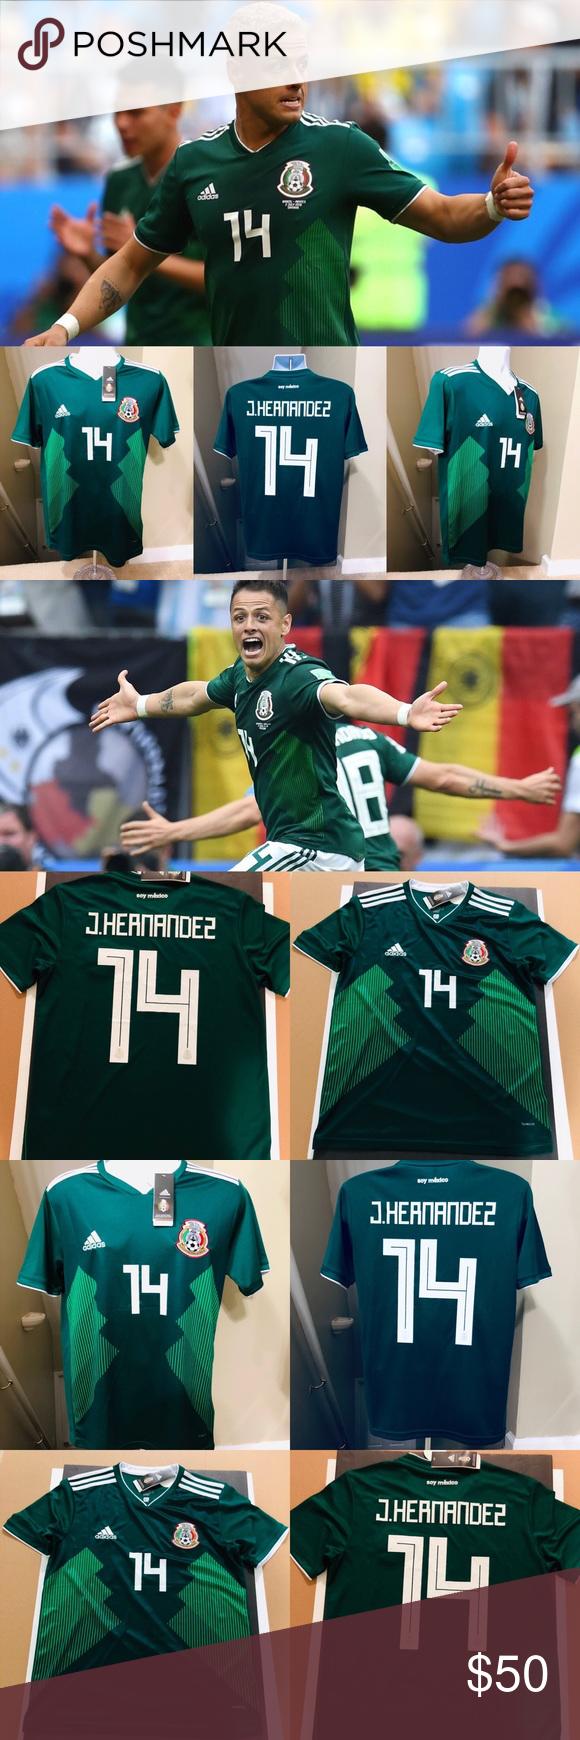 "b5243e8a3 J Hernández #14 Mexico Chicharito Soccer Jersey 2018 Mexico World Cup  Jersey Javier Hernández #14 aka ""Chicharito Mexico National Football Team  Brand New ..."